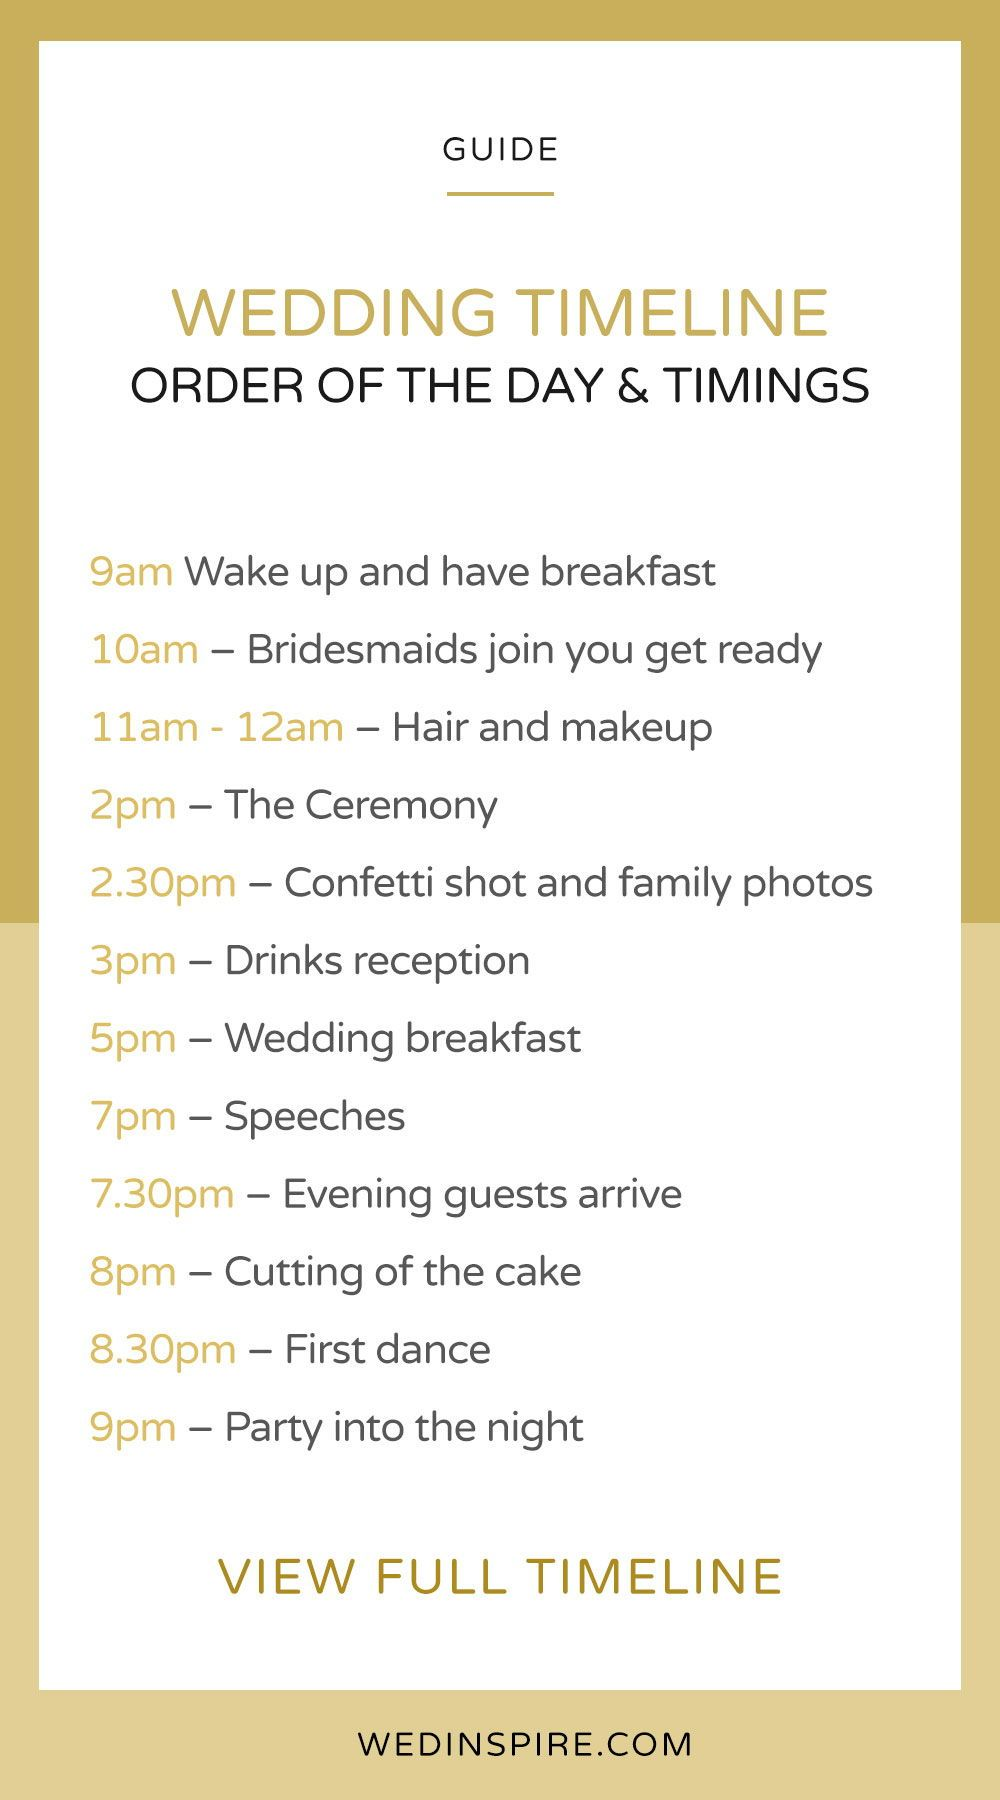 Good wedding day timeline to follow! Wedding schedule